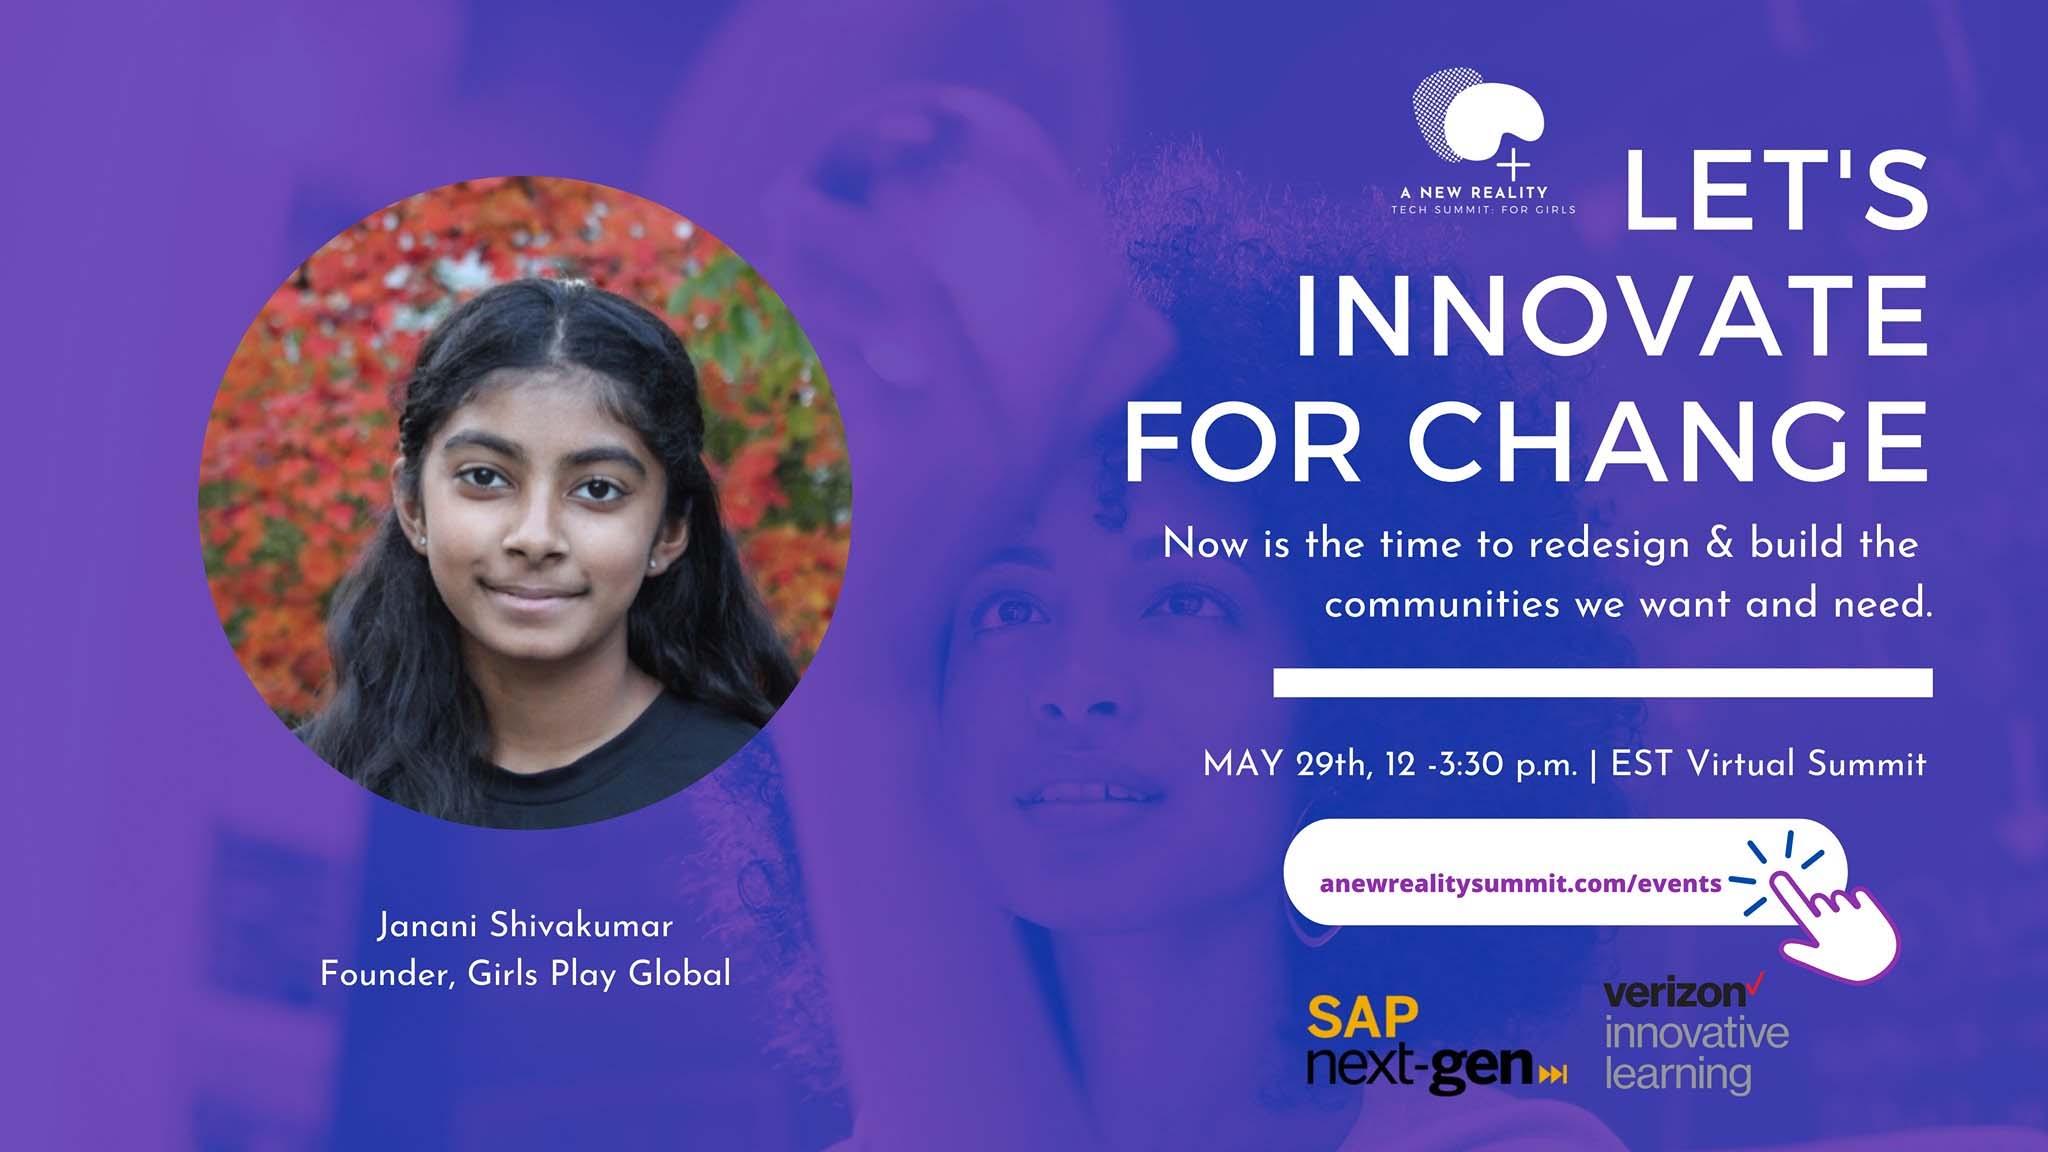 Let-s-innovate-for-change-janani-shivakumar